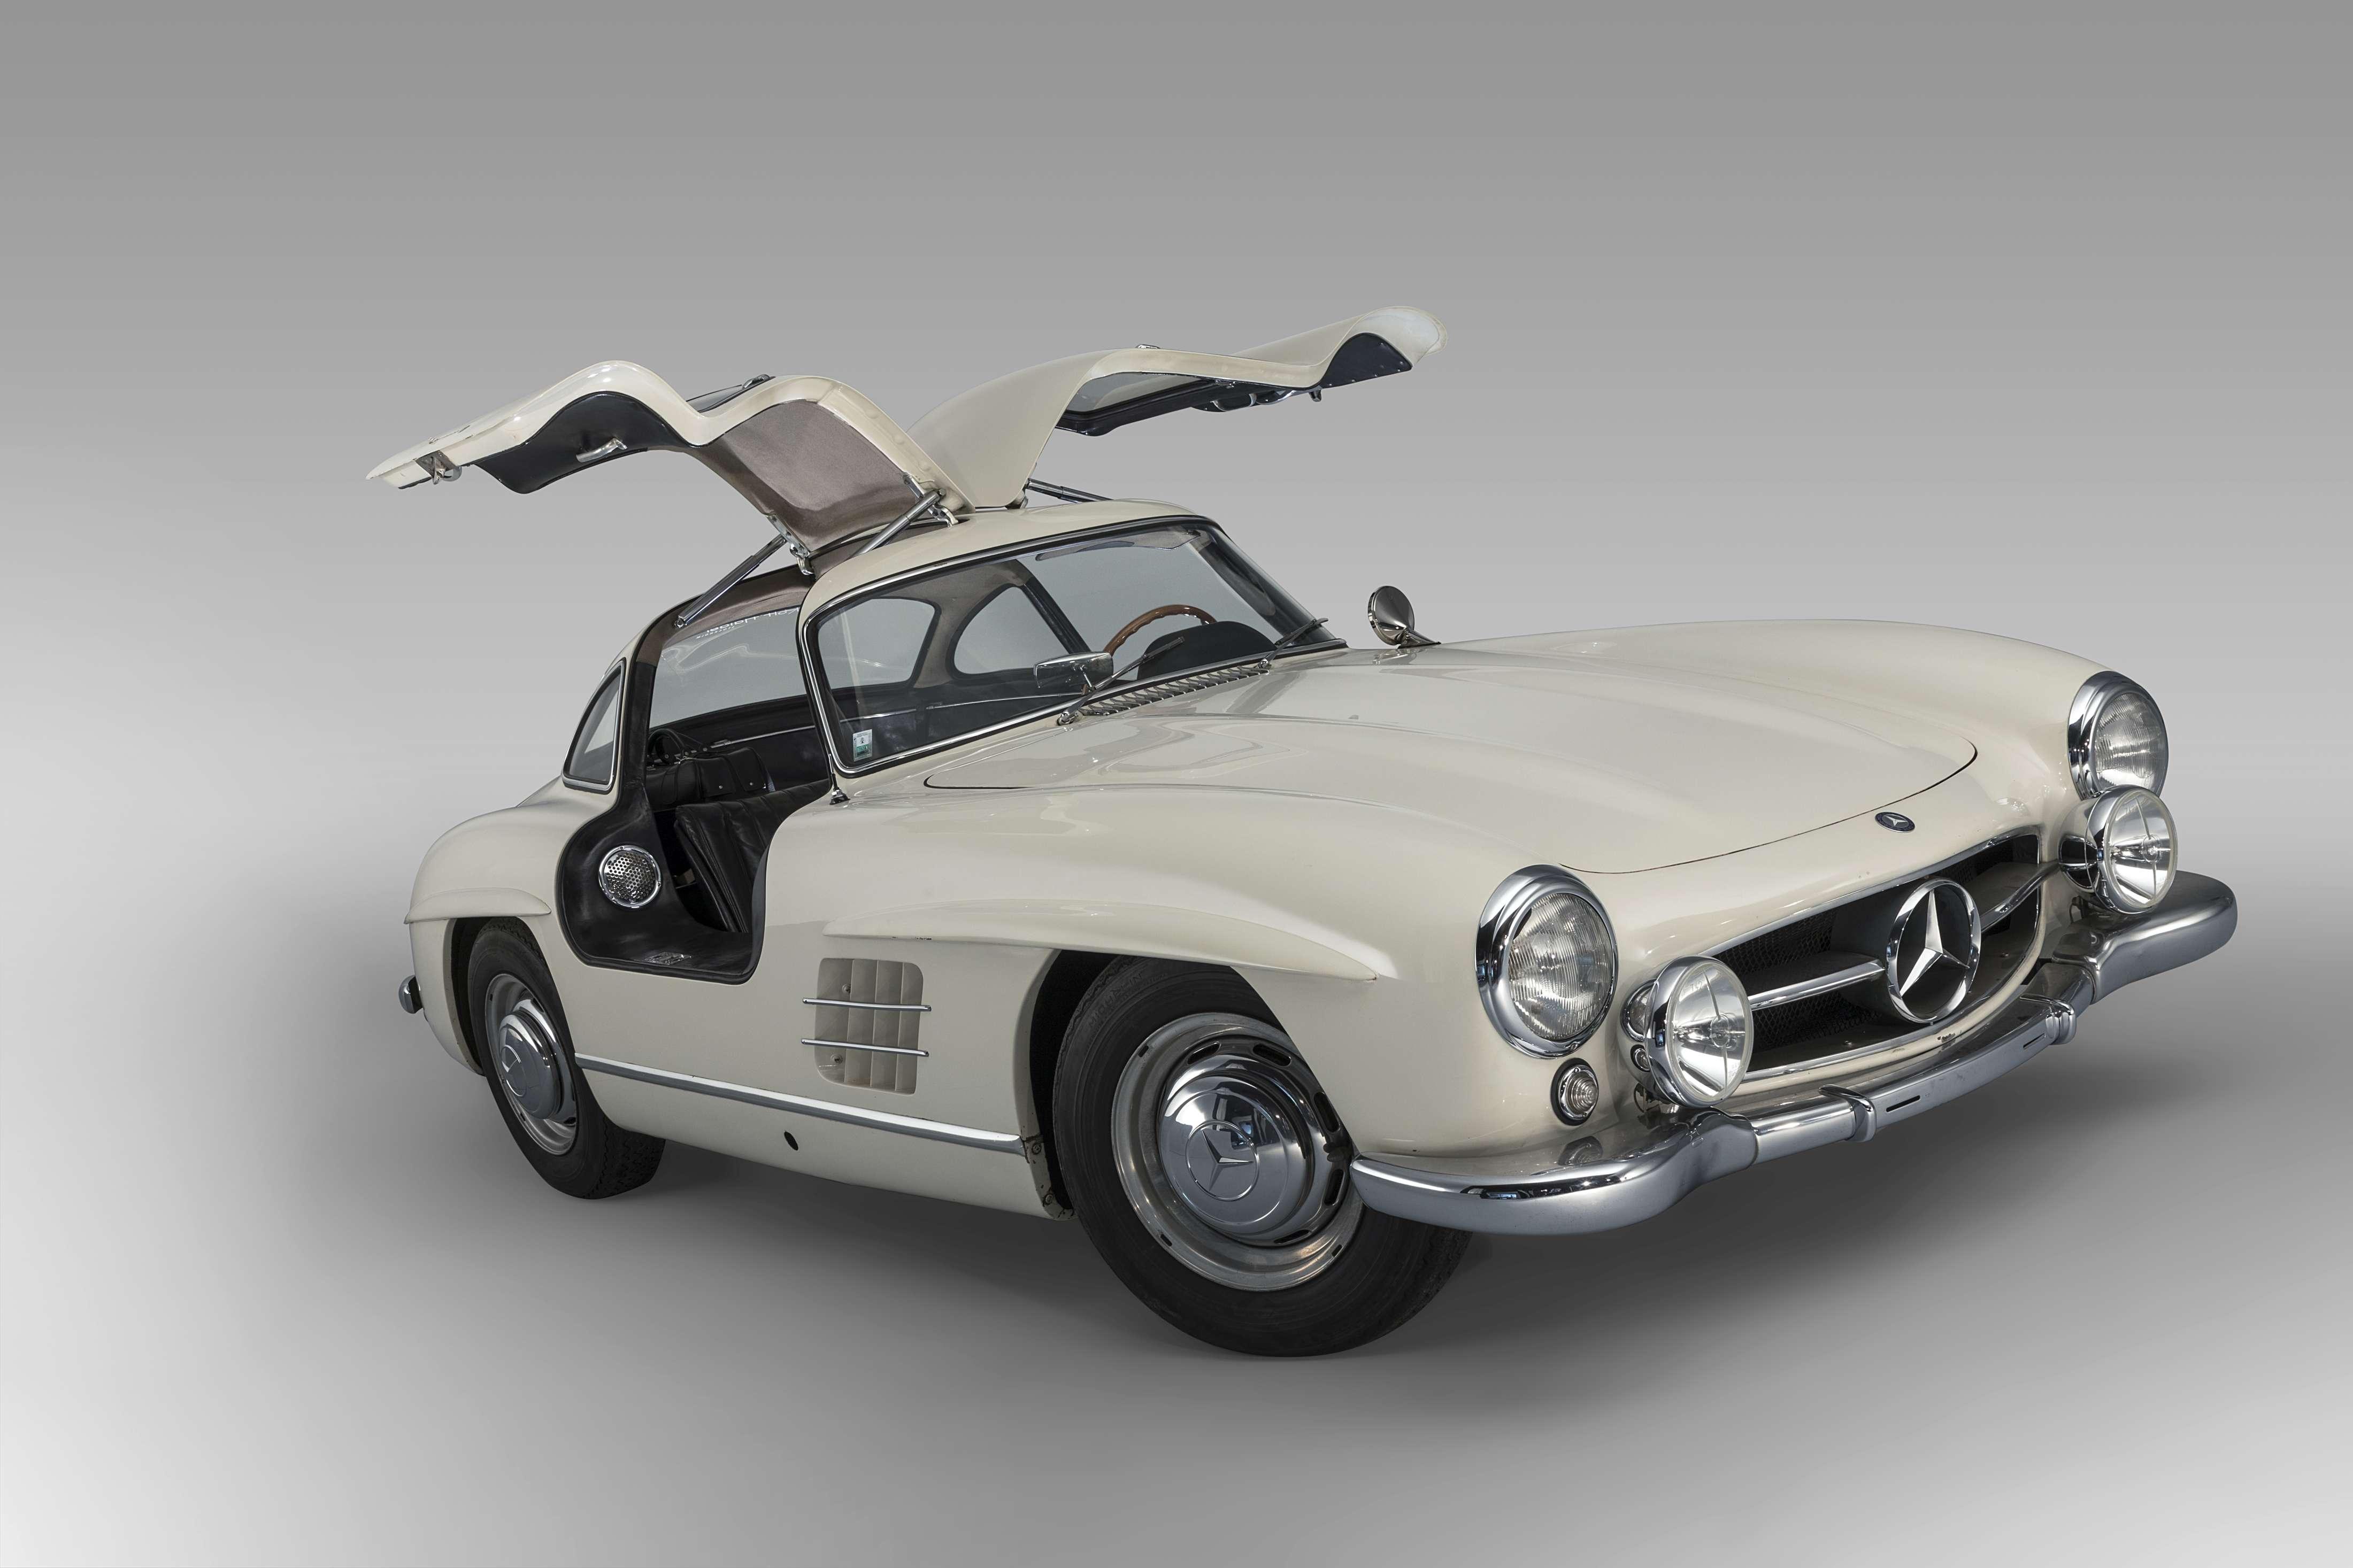 Mercedes1956 300 SL Gullwing